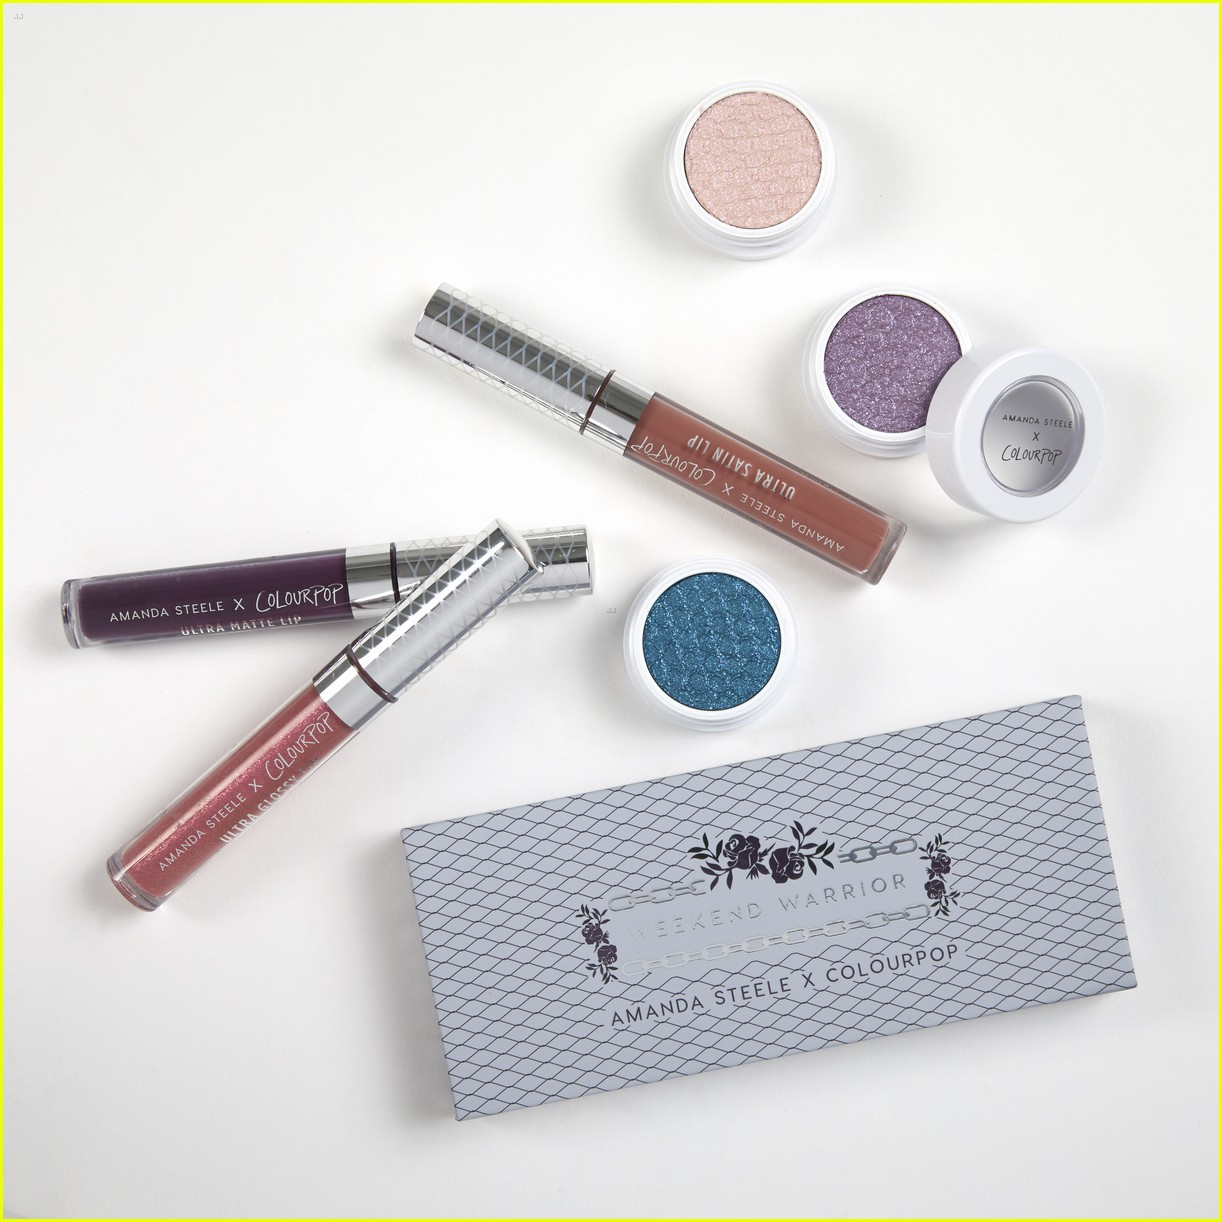 amanda steele collabs colourpop cosmetics collection 07